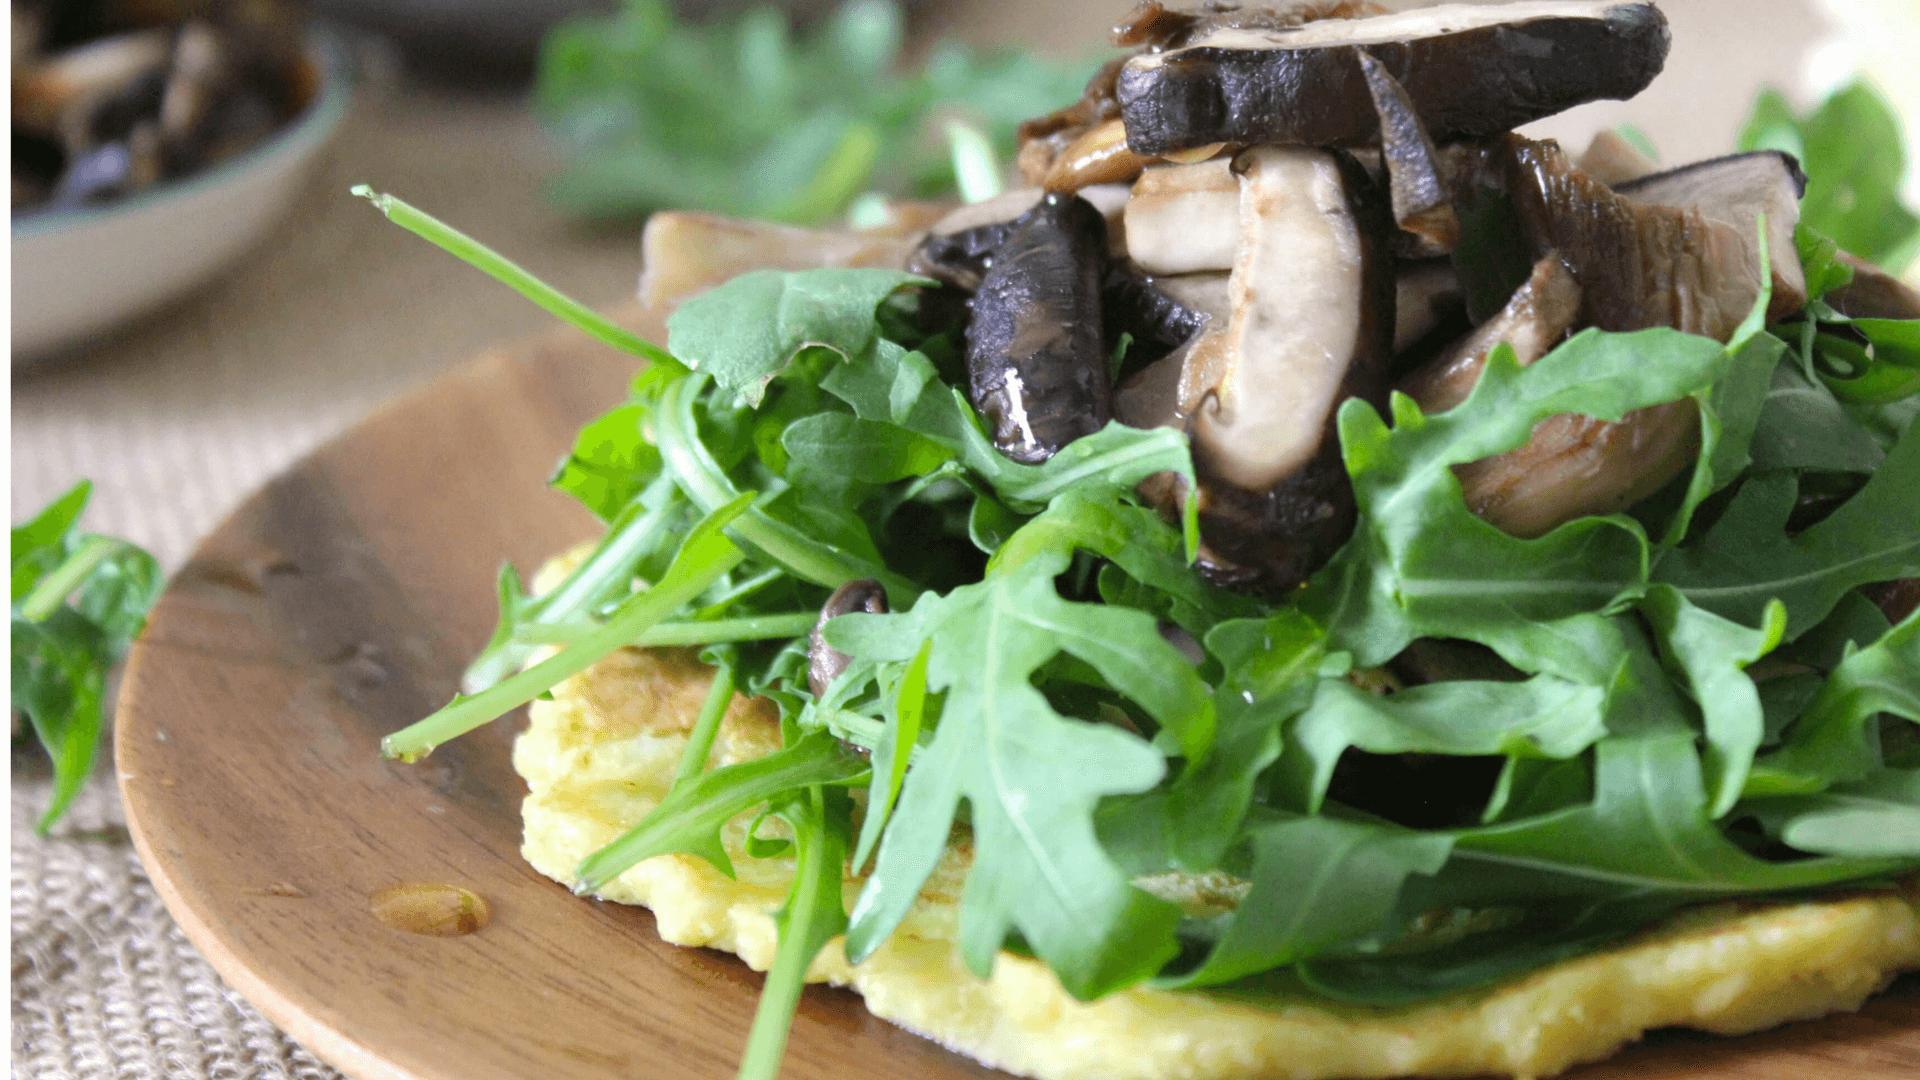 Cauliflower pancakes with wild mushrooms